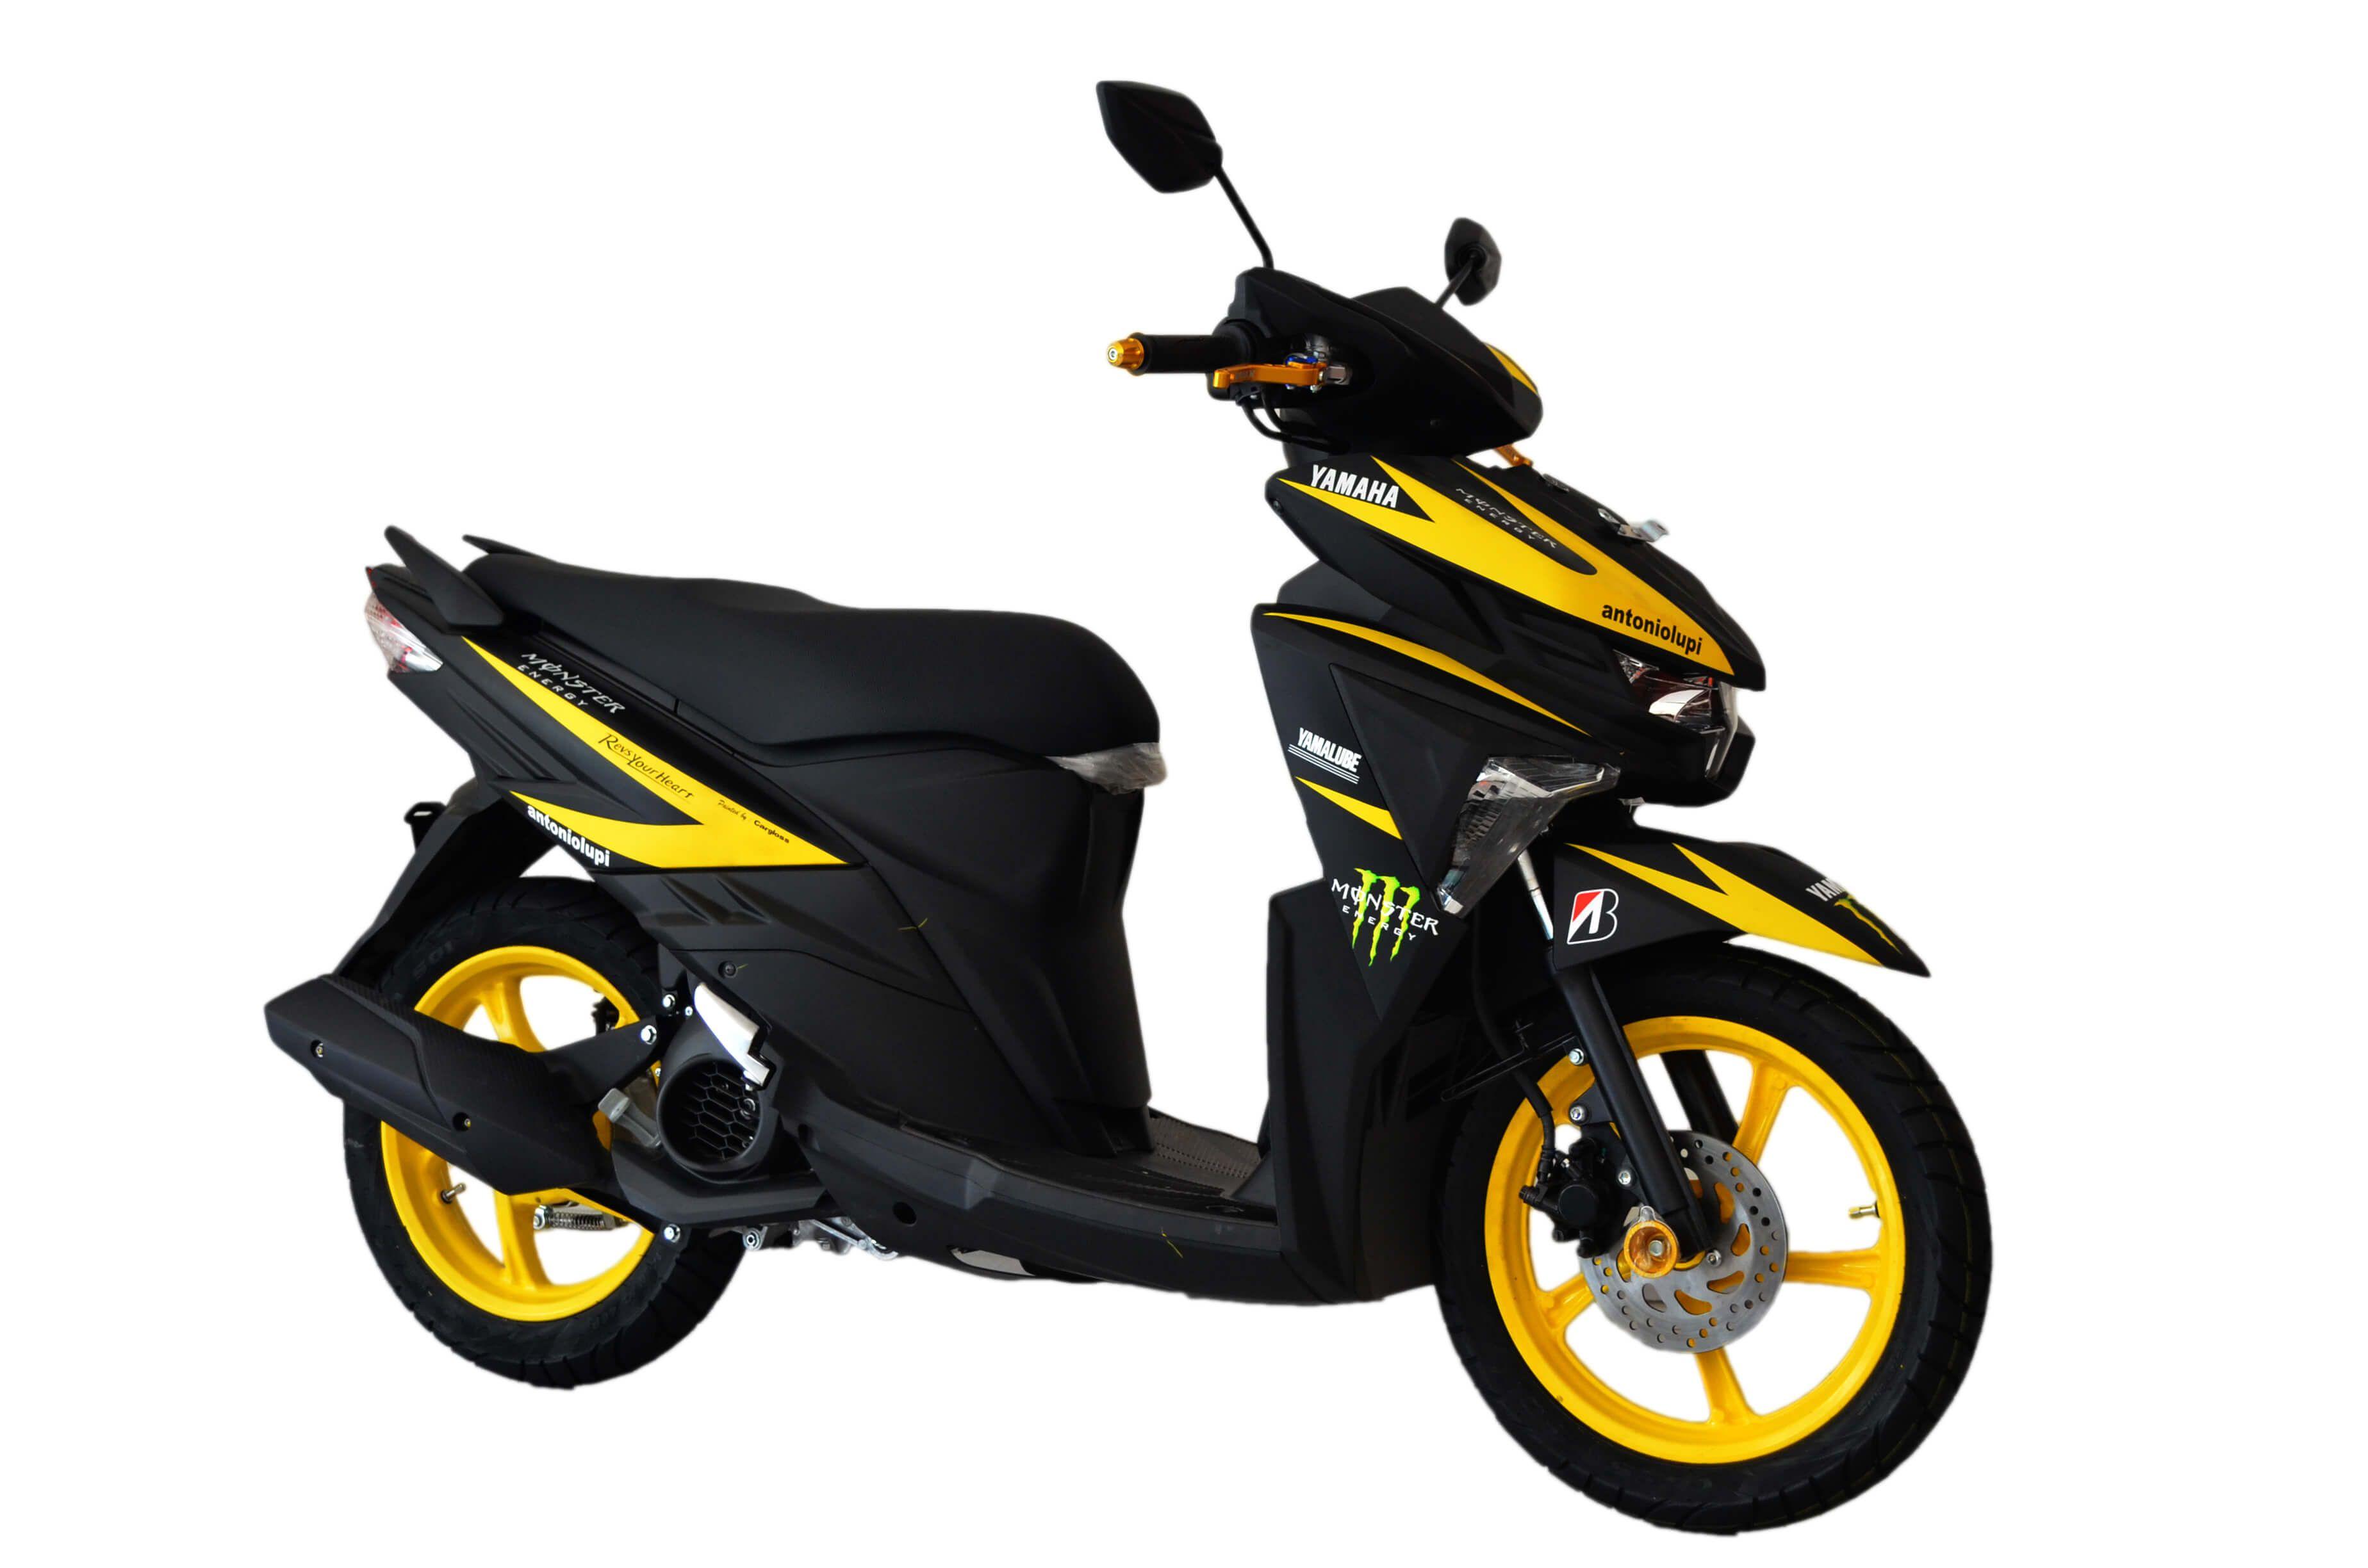 Diskon Spesial Harga Kredit Modifikasi Motor Yamaha Soul Gt 125